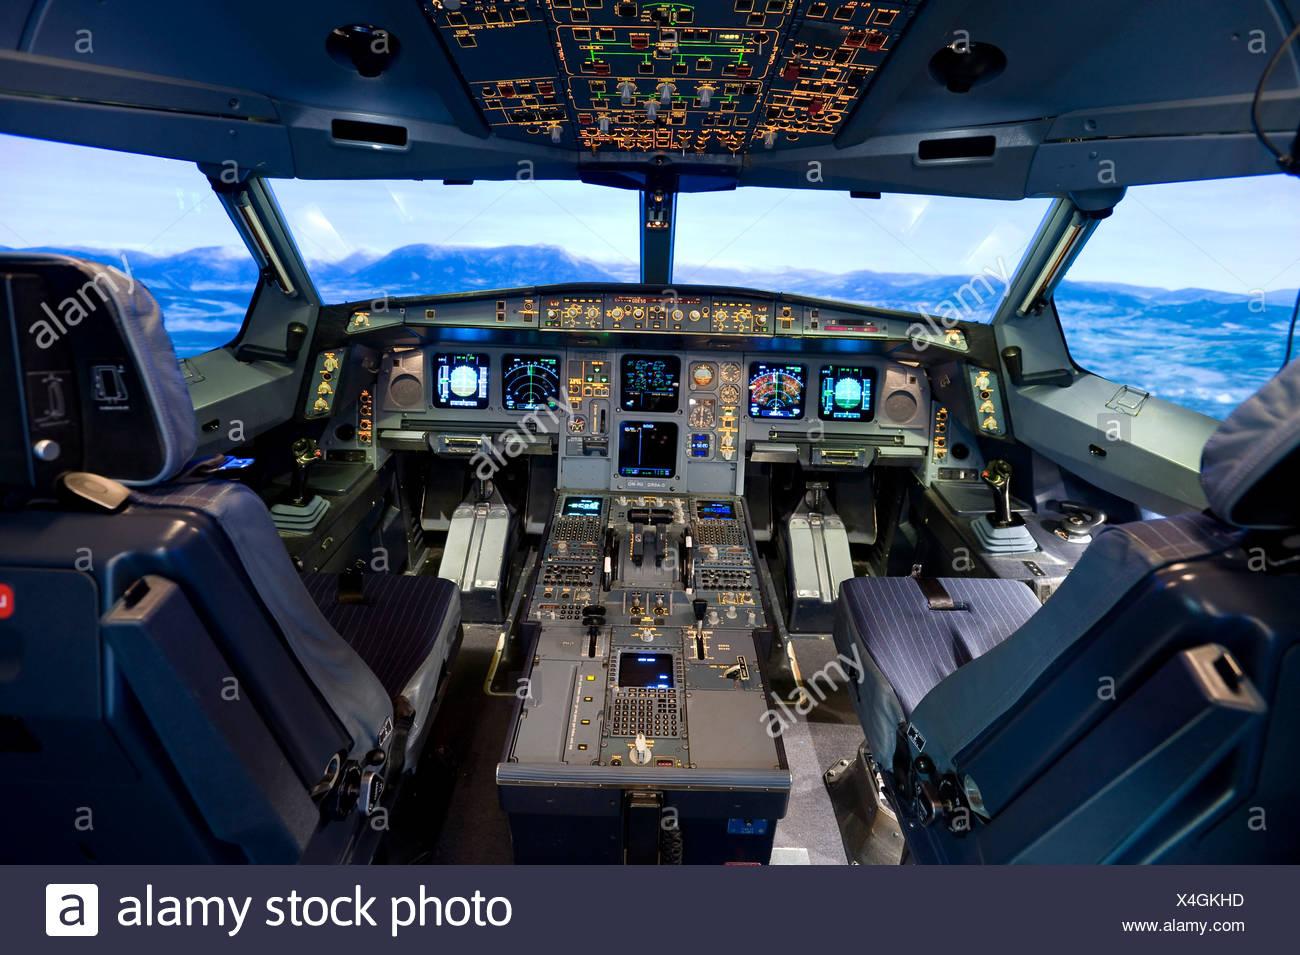 Zentrum fuer Flugsimulation Flight Simulation Center Berlin, ZFB, cockpit of an Airbus A330/340 flight simulator, Berlin, Germa - Stock Image